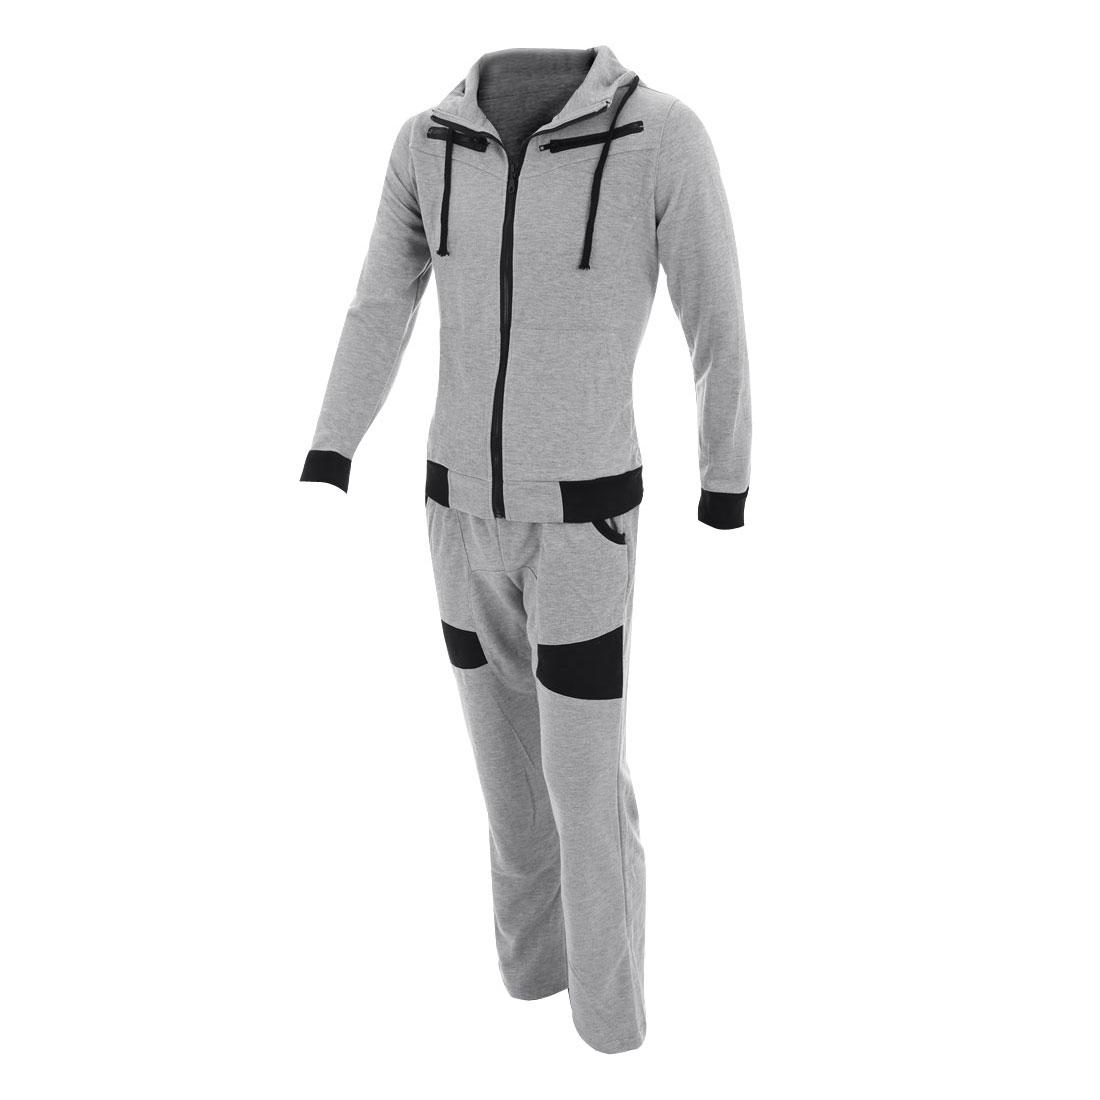 Women Hooded Zip Up Hoodie & Pockets Color Block Pants Light Gray M